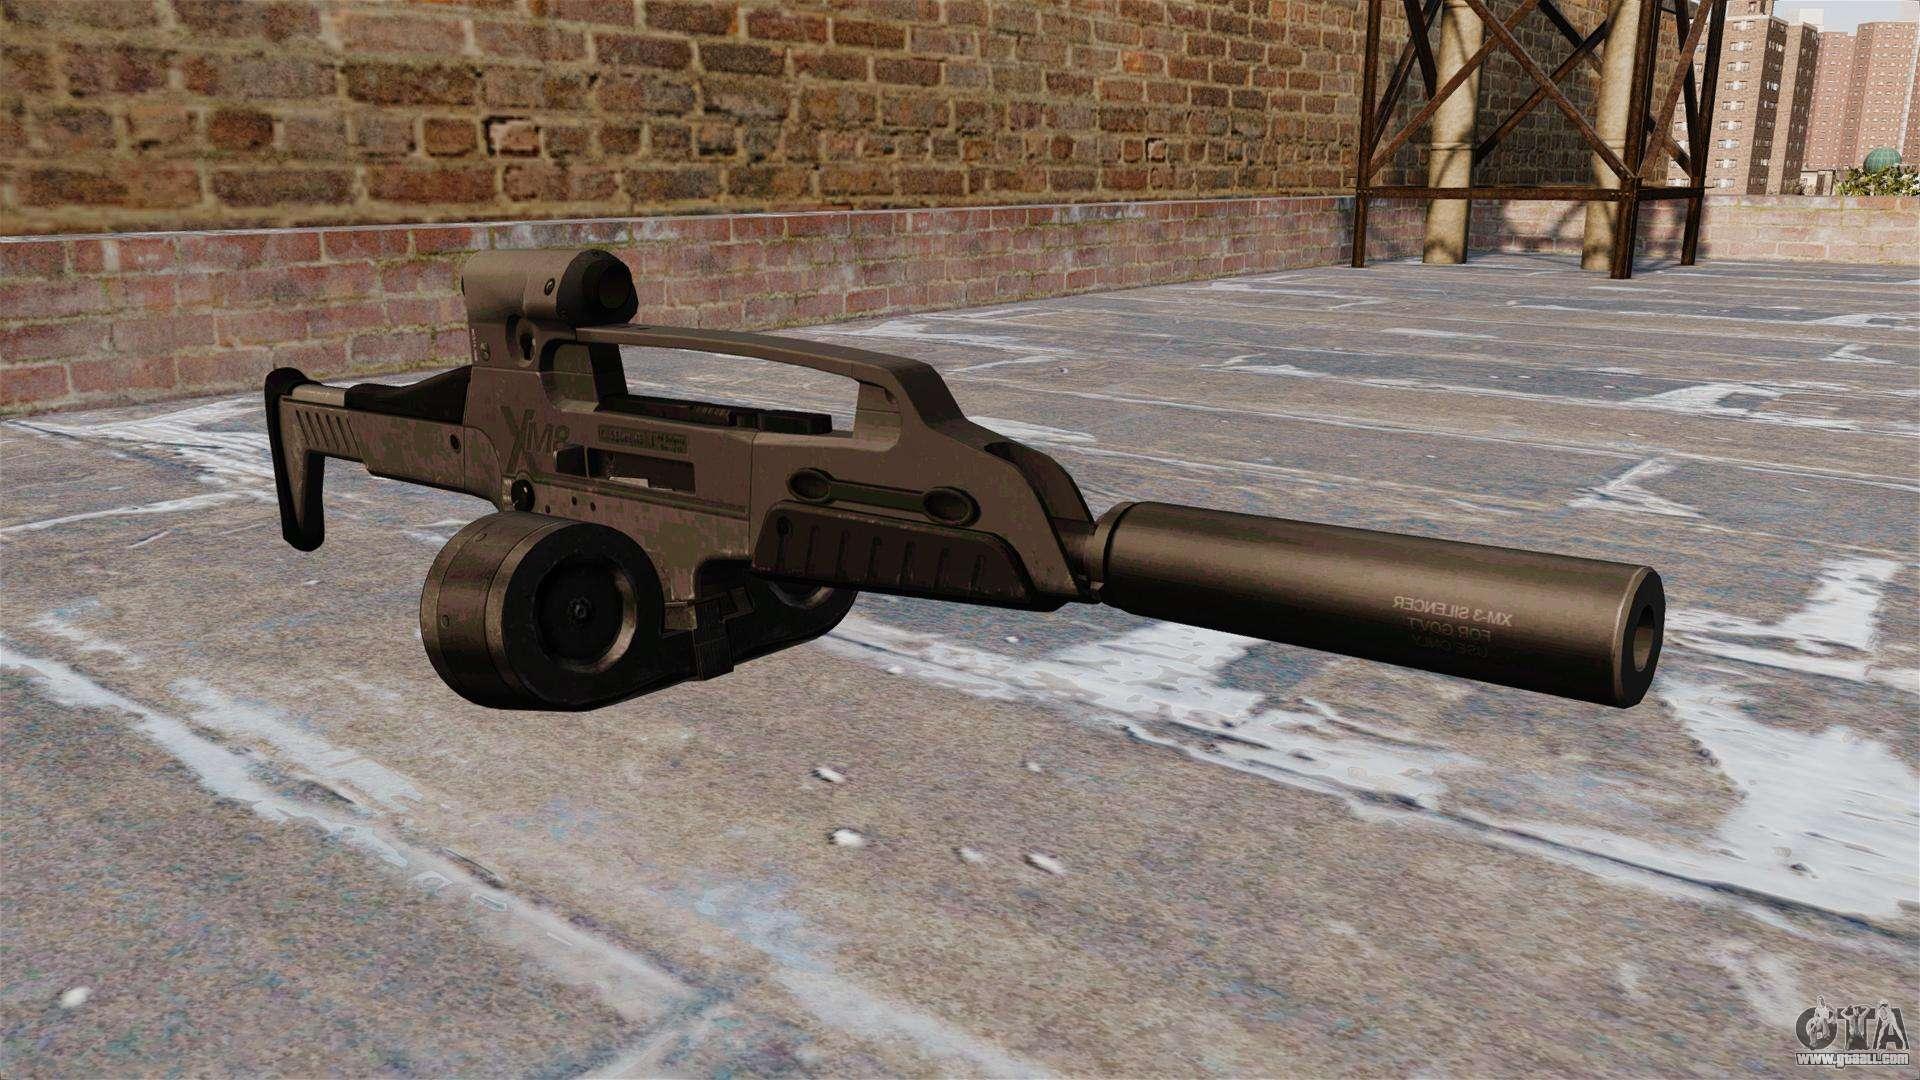 Objective Individual Combat Weapon  Wikipedia